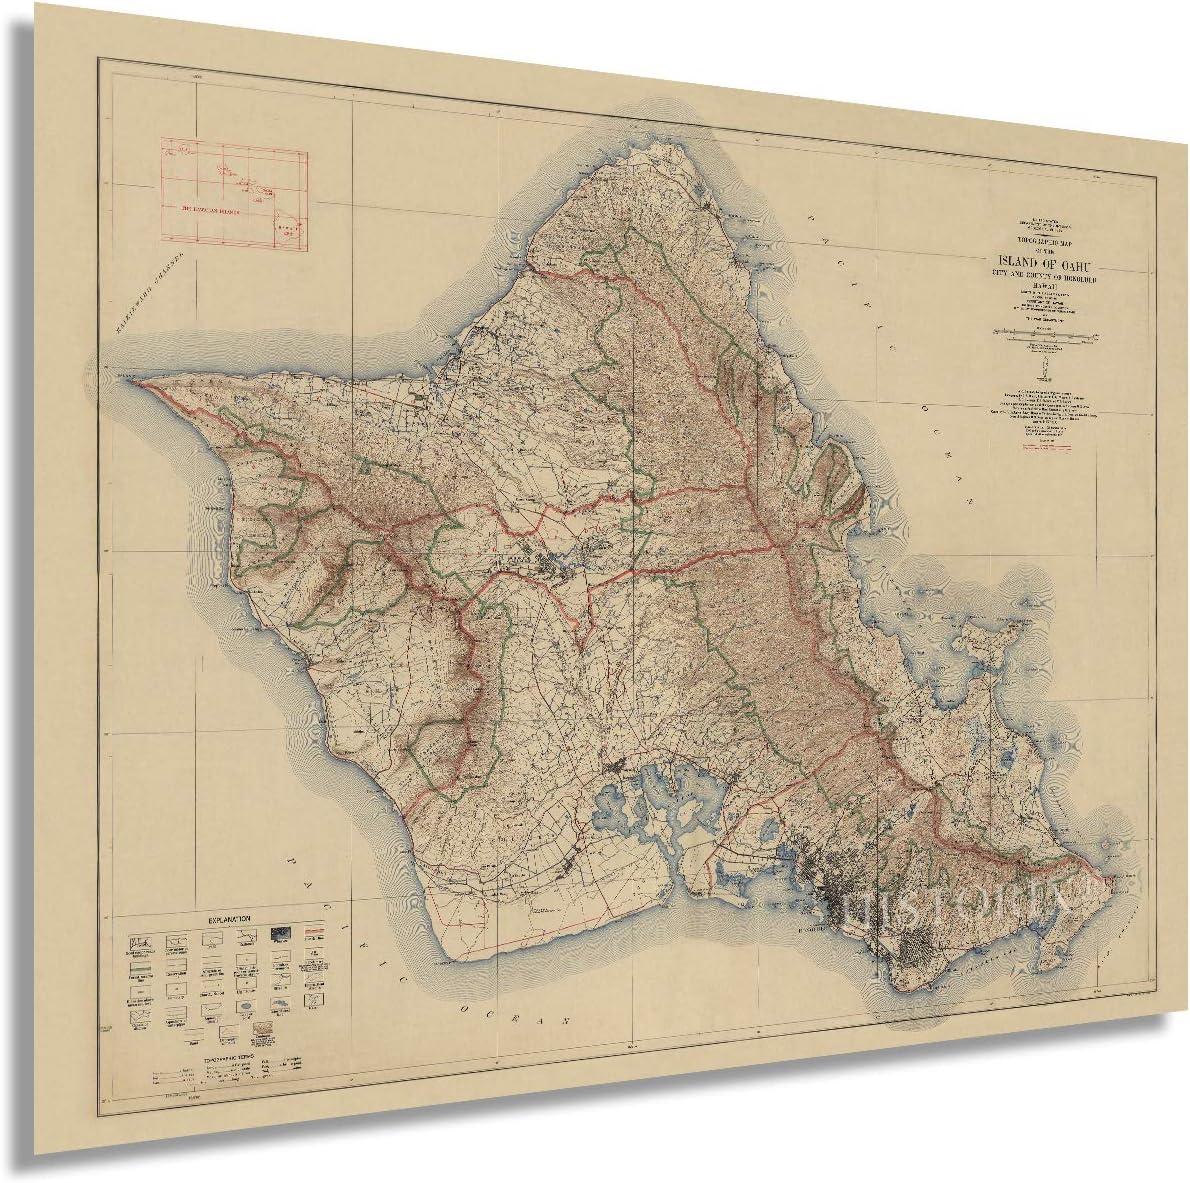 Historix Vintage 1938 In Max 65% OFF stock Island of Oahu Inch - Hawai Map 18x24